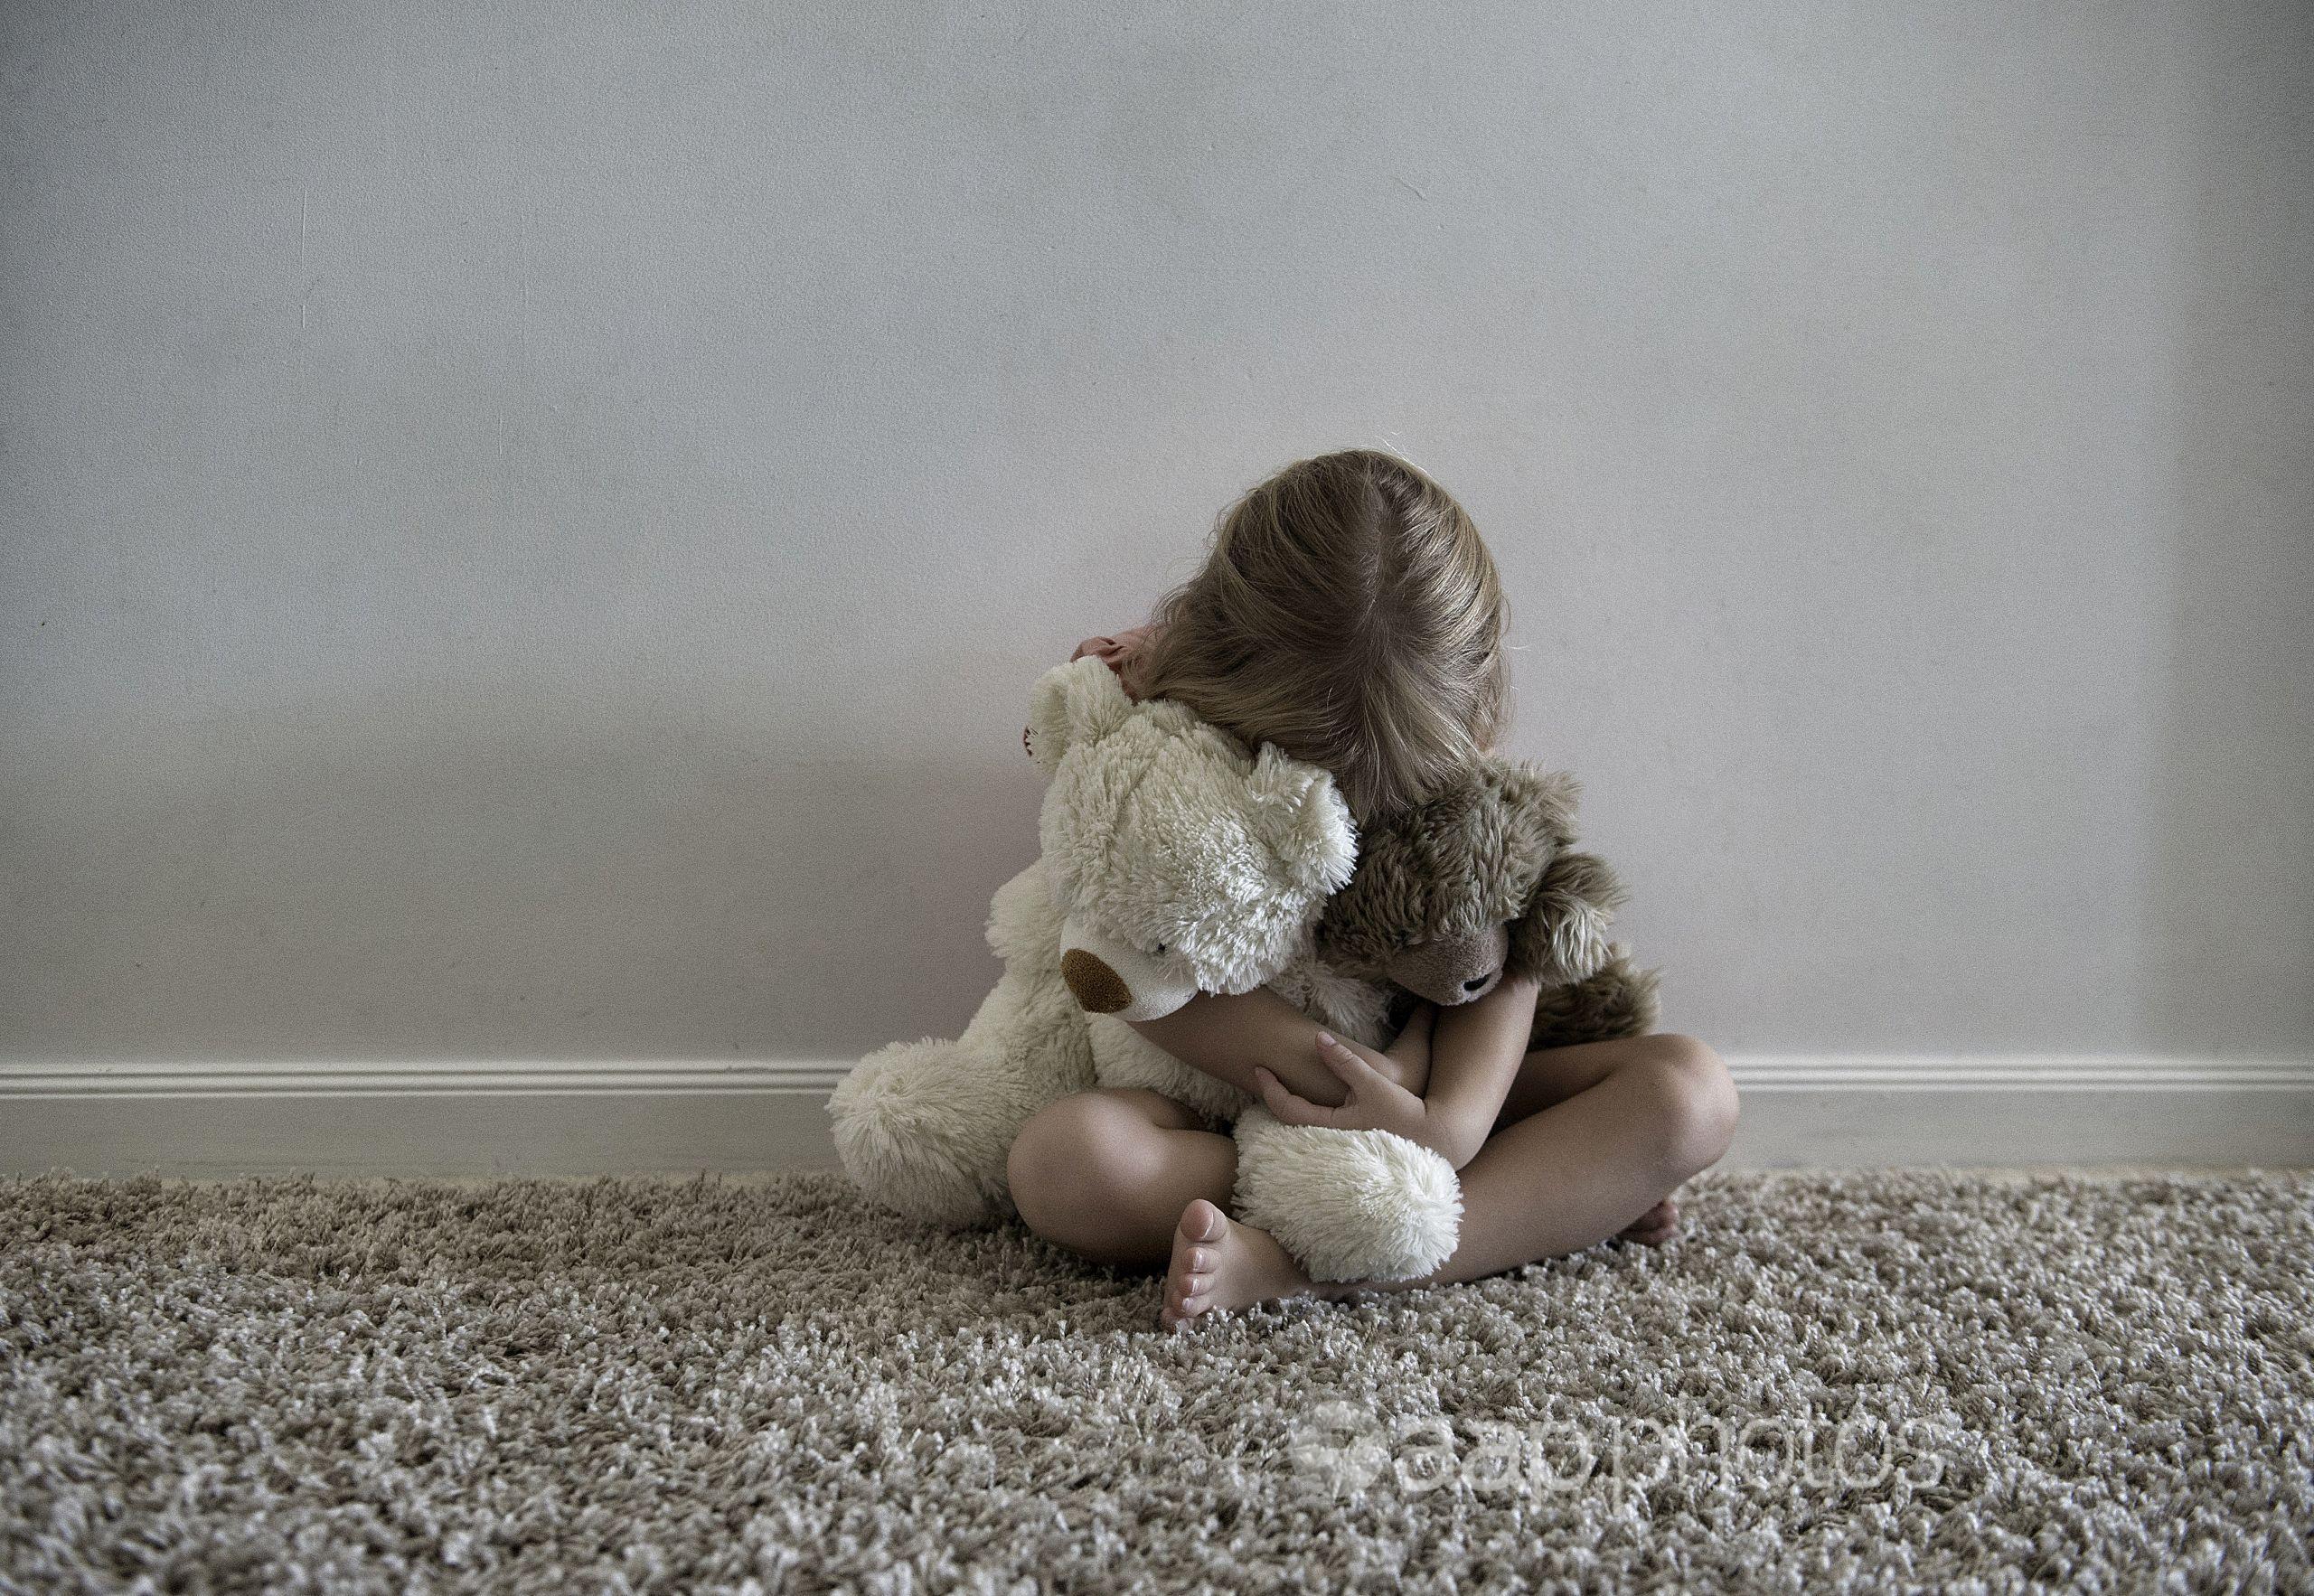 A little girl hugging toys.